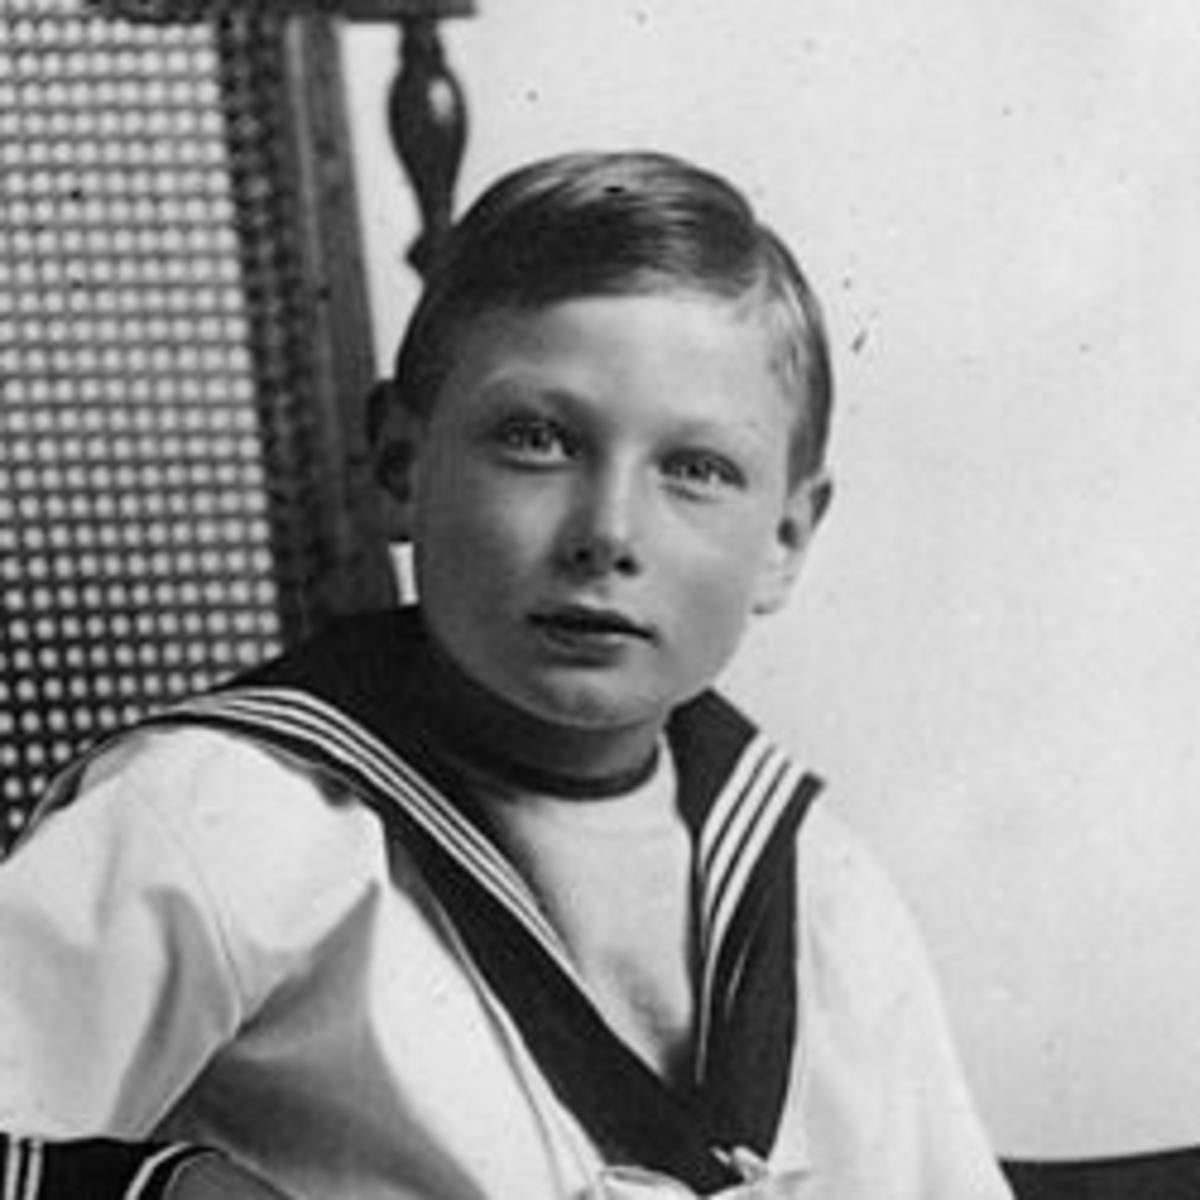 Prince John